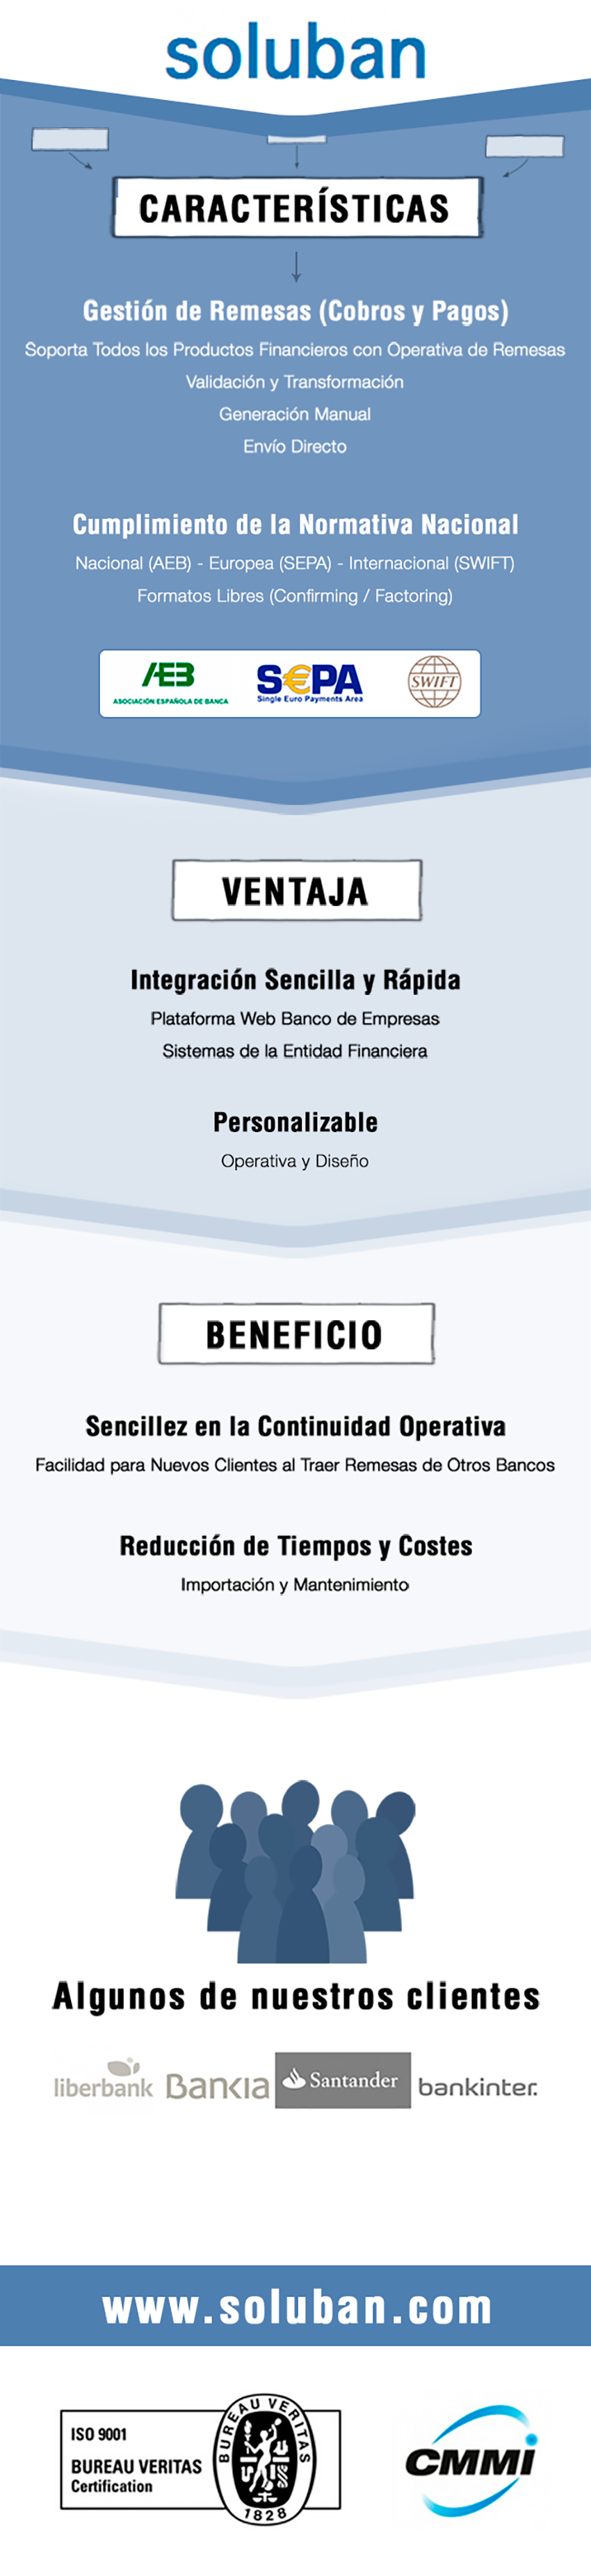 diseño gráfico infografia